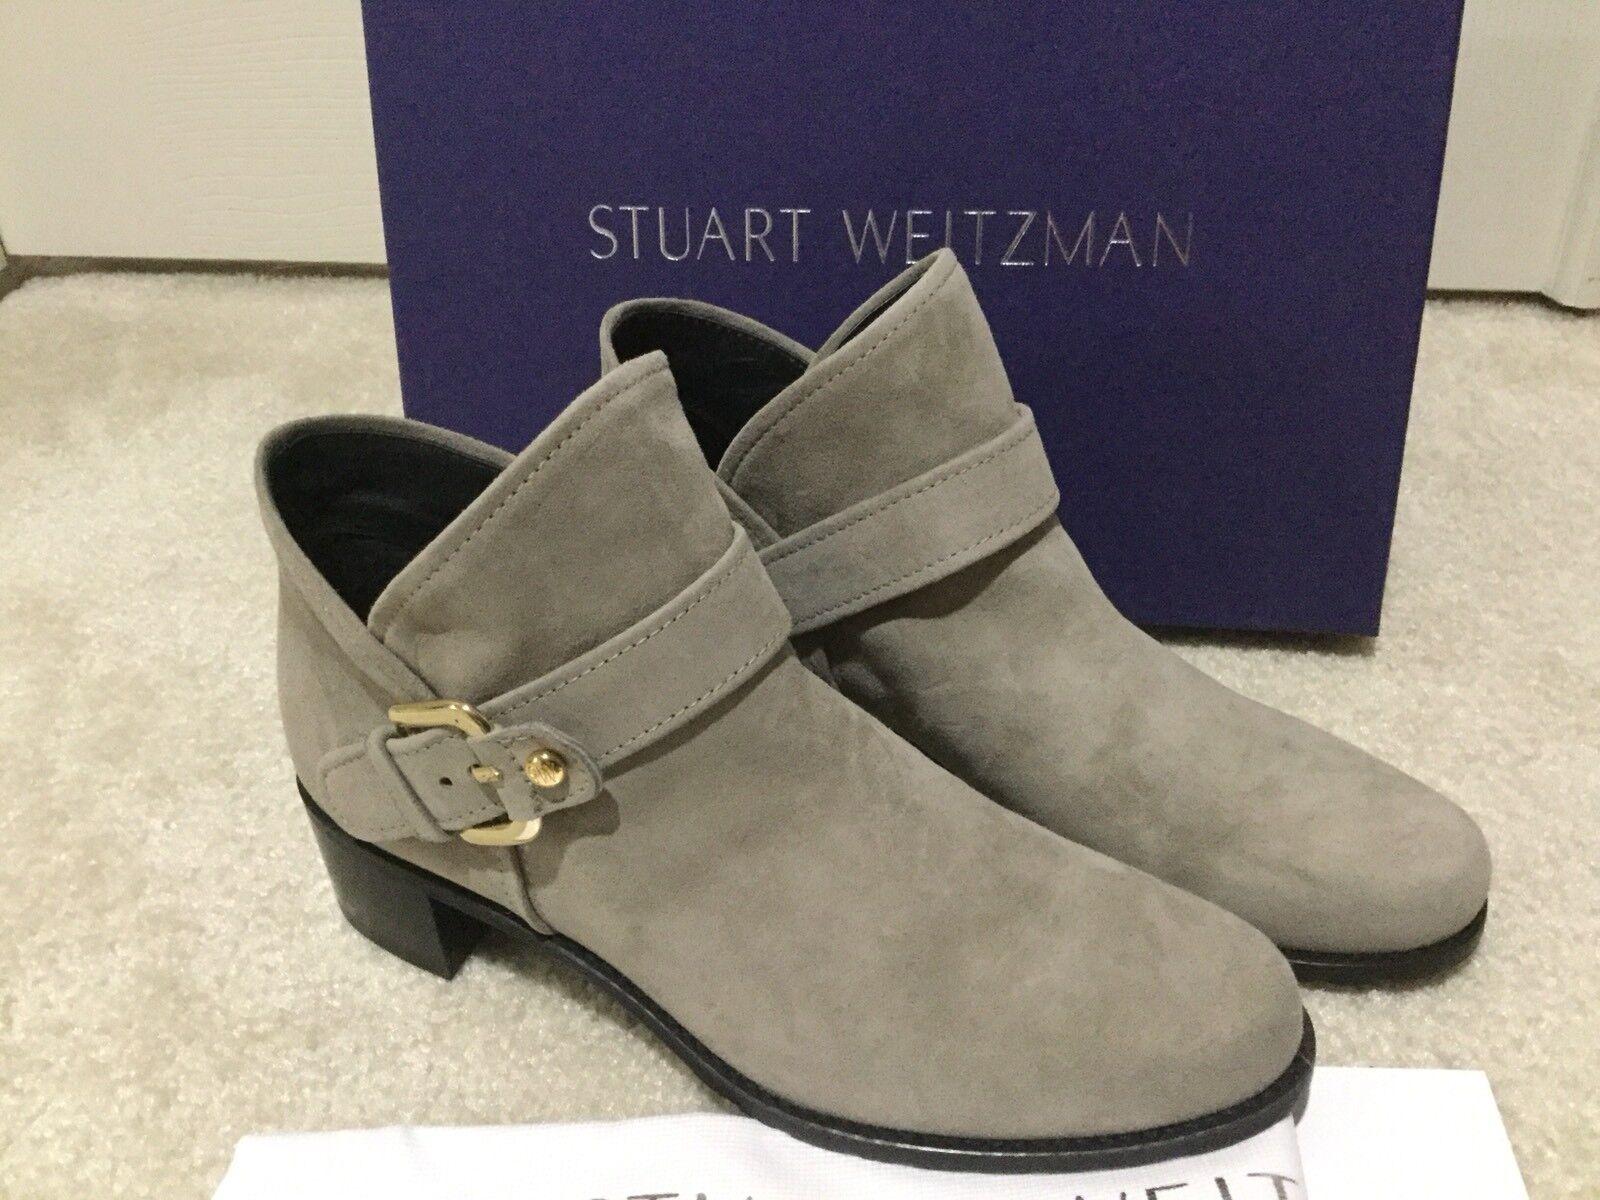 NIB Stuart Weitzman Dude Suede Buckled Ankle Bootie Gray Size 6.5